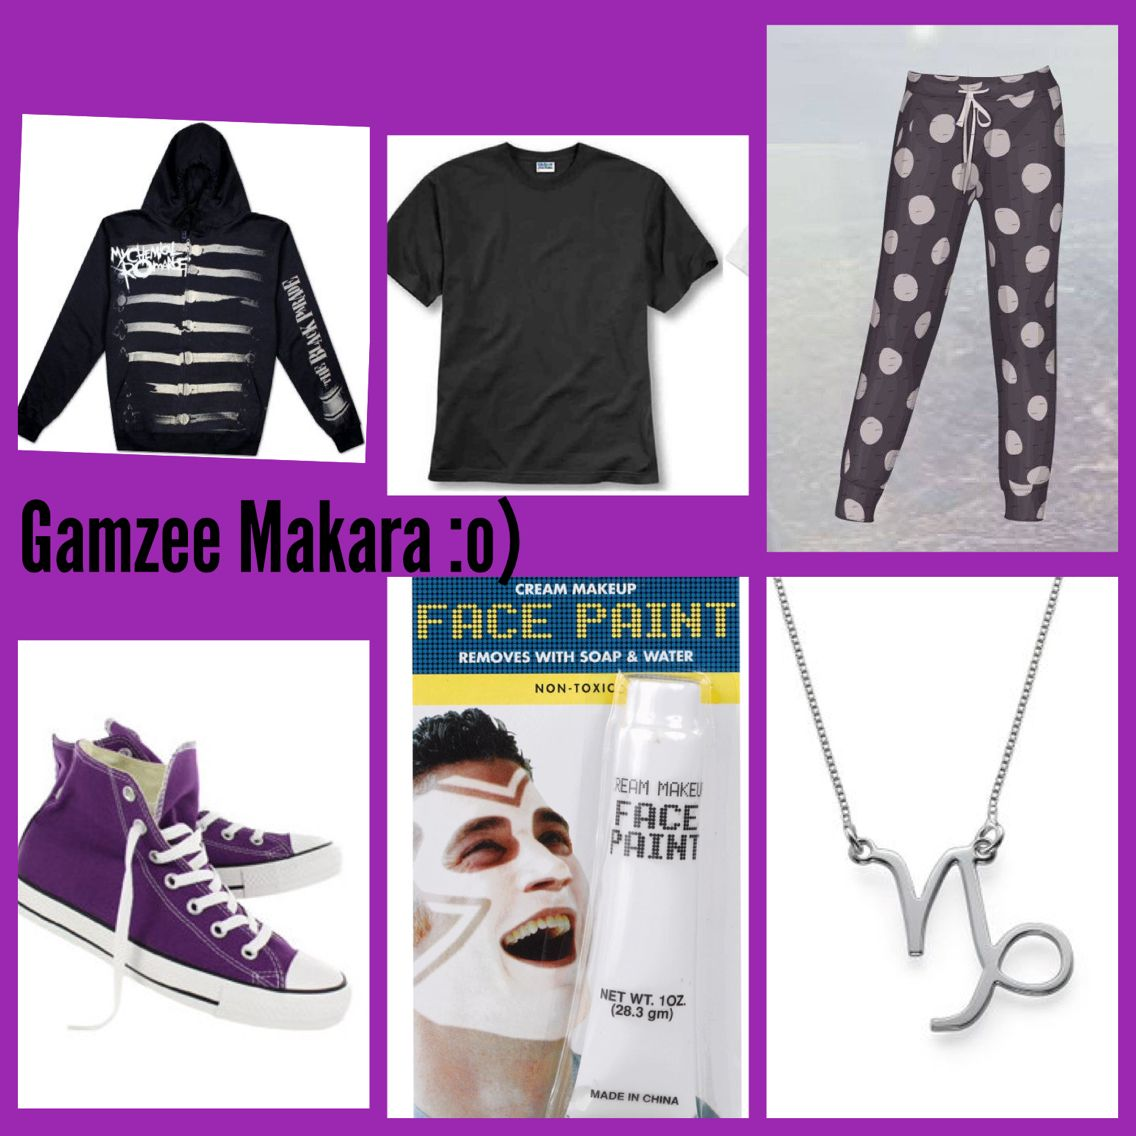 Gamzee Makara themed outfit  #Homestuck #Fashion #Clothing